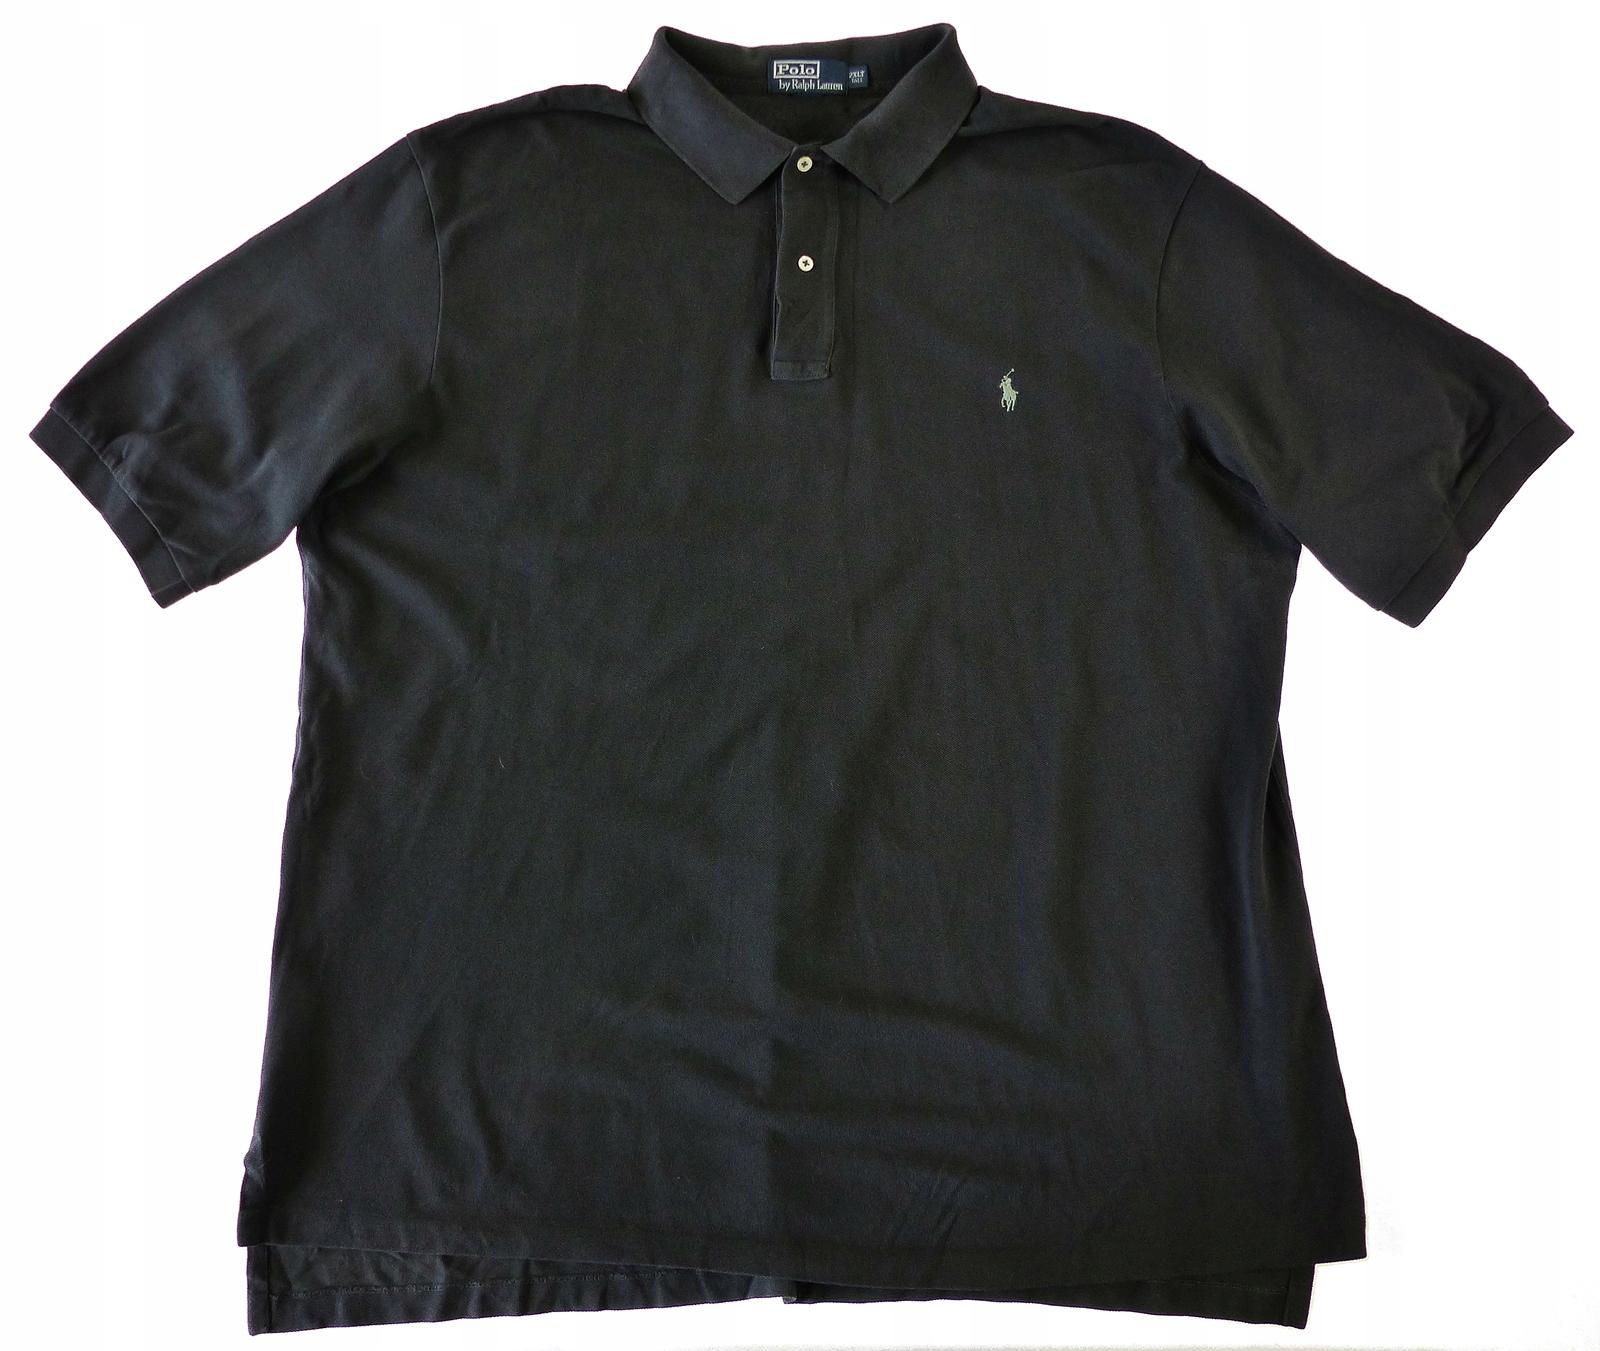 Koszulka polo Ralph Lauren 2XL w klatce 124cm